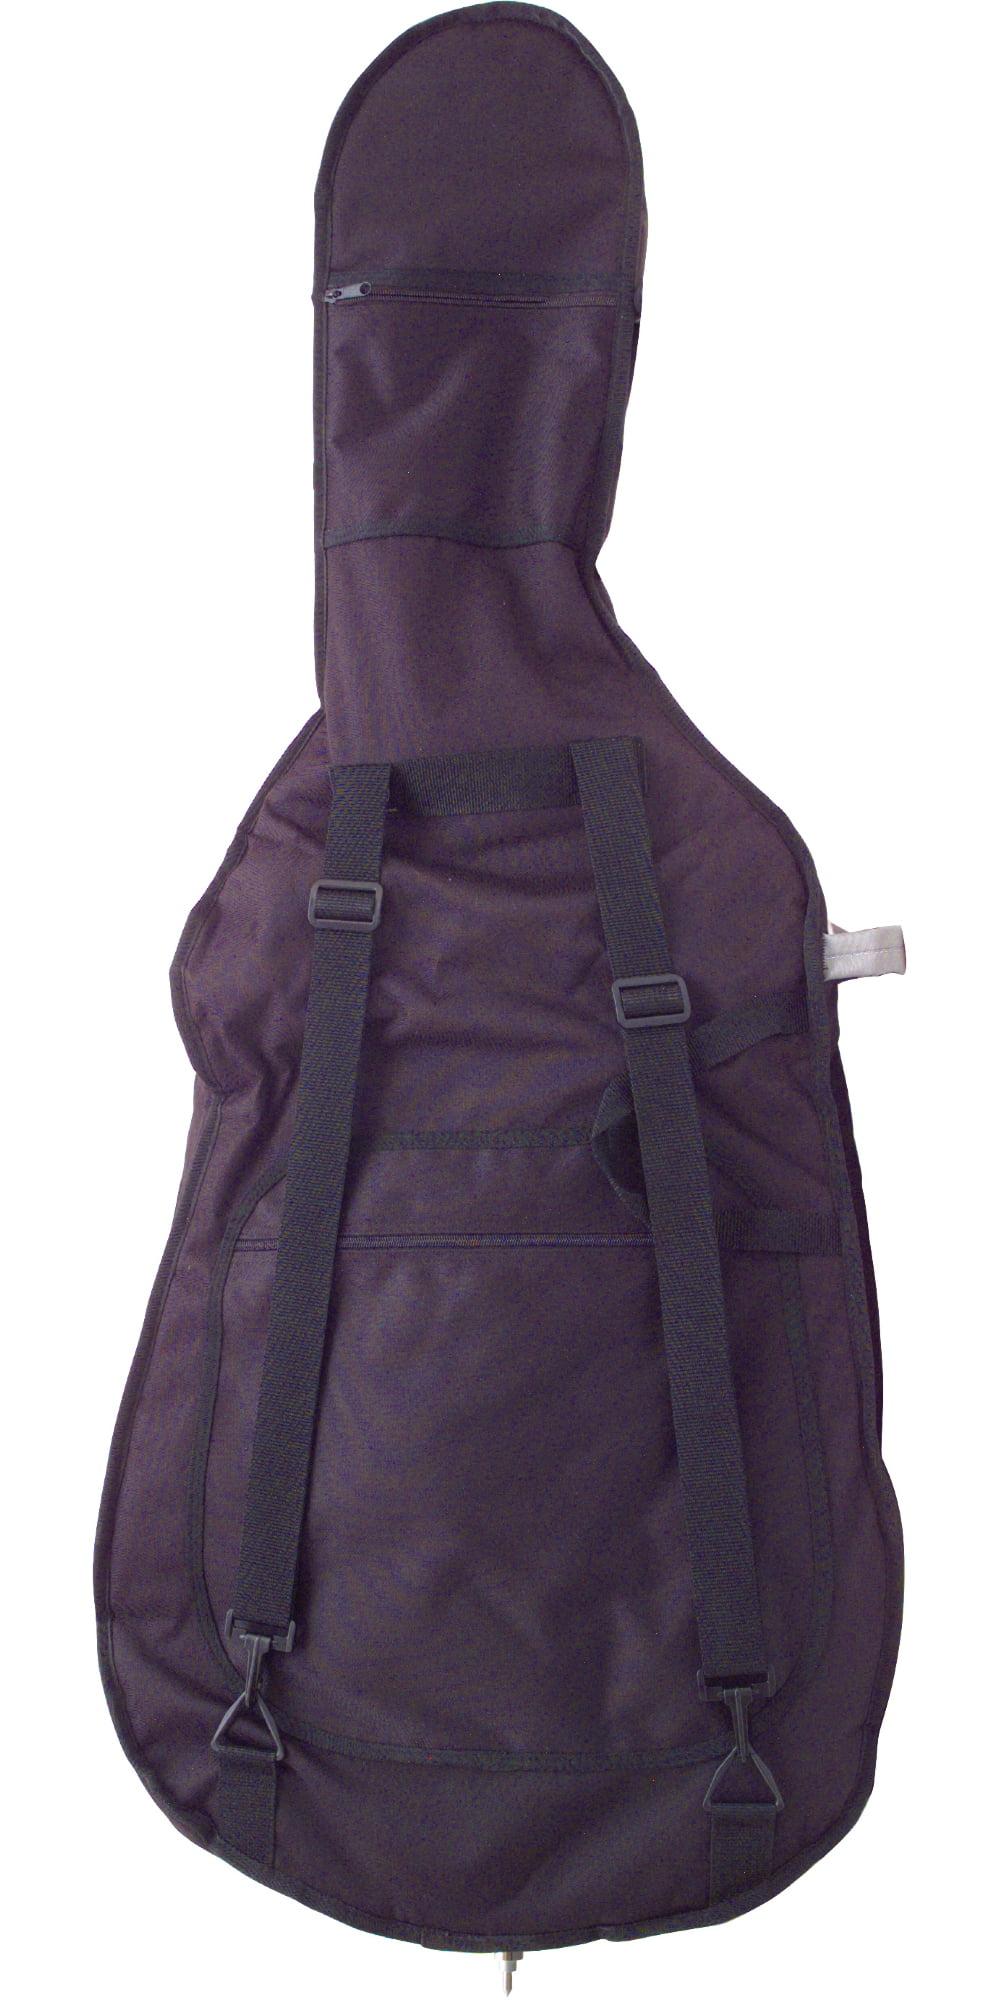 Student Cello Bag by Bellafina